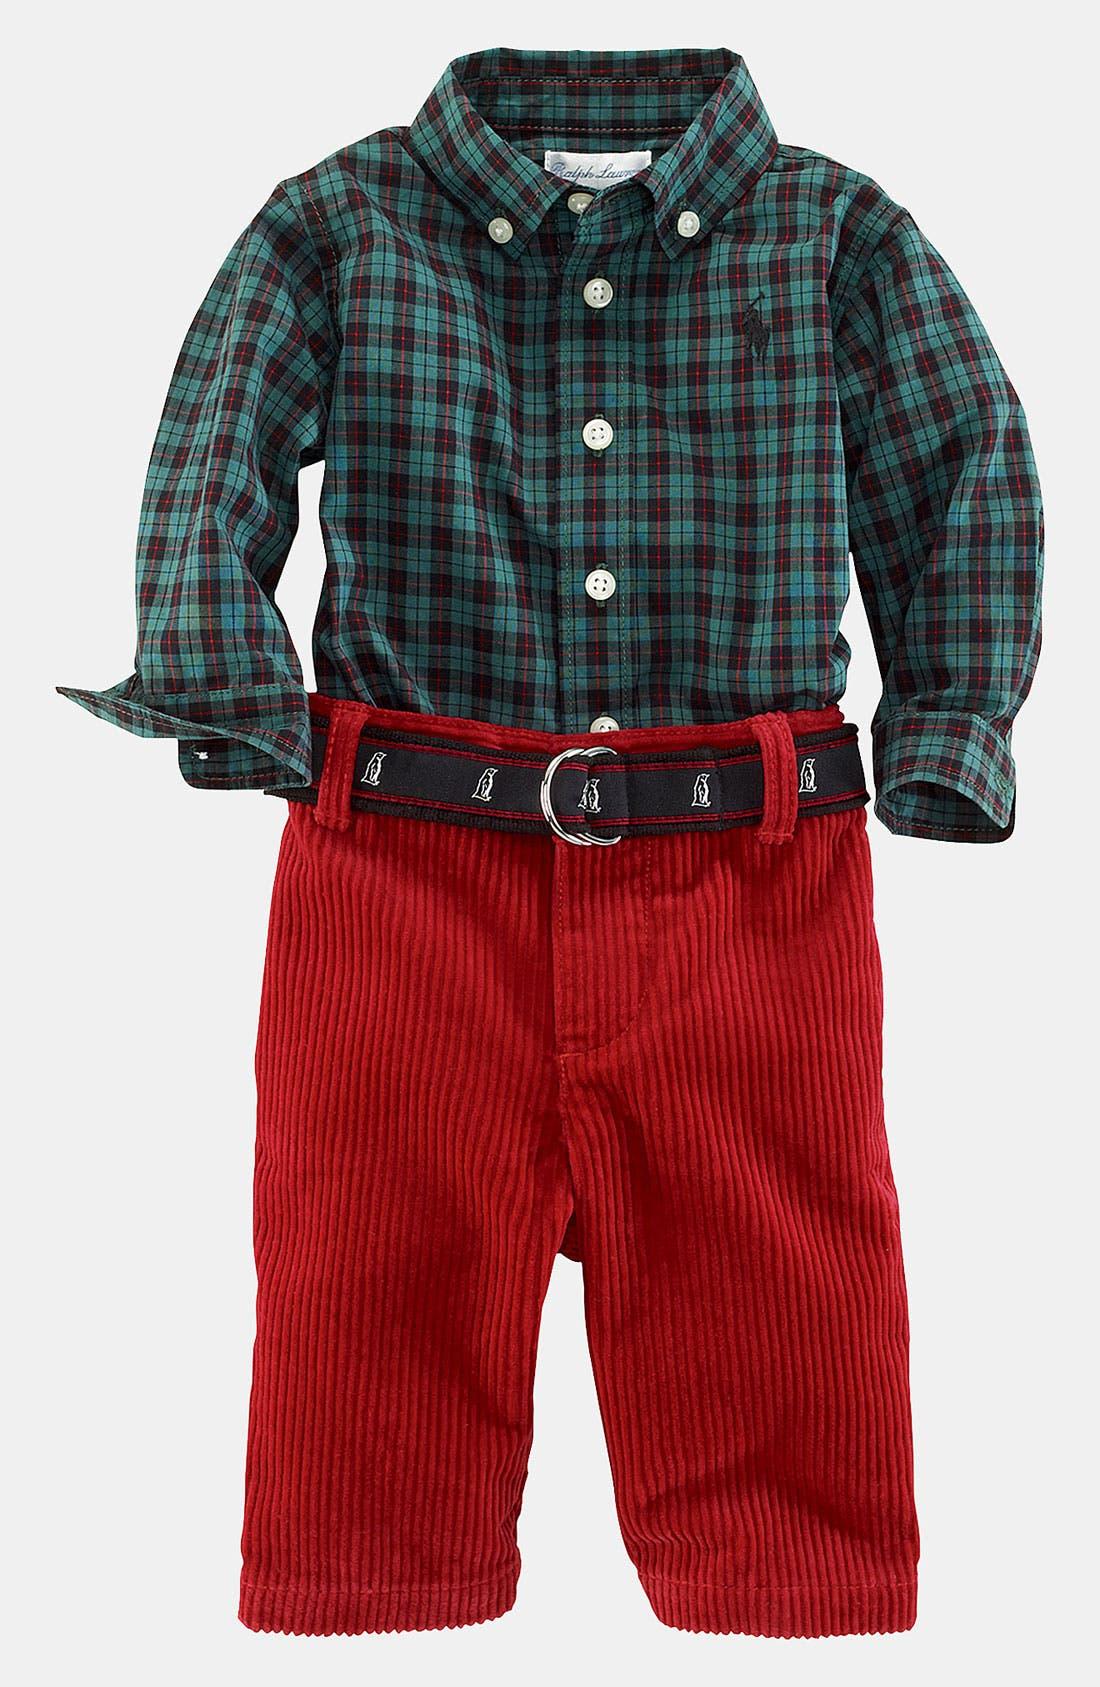 Alternate Image 1 Selected - Ralph Lauren Woven Shirt & Pants (Infant)